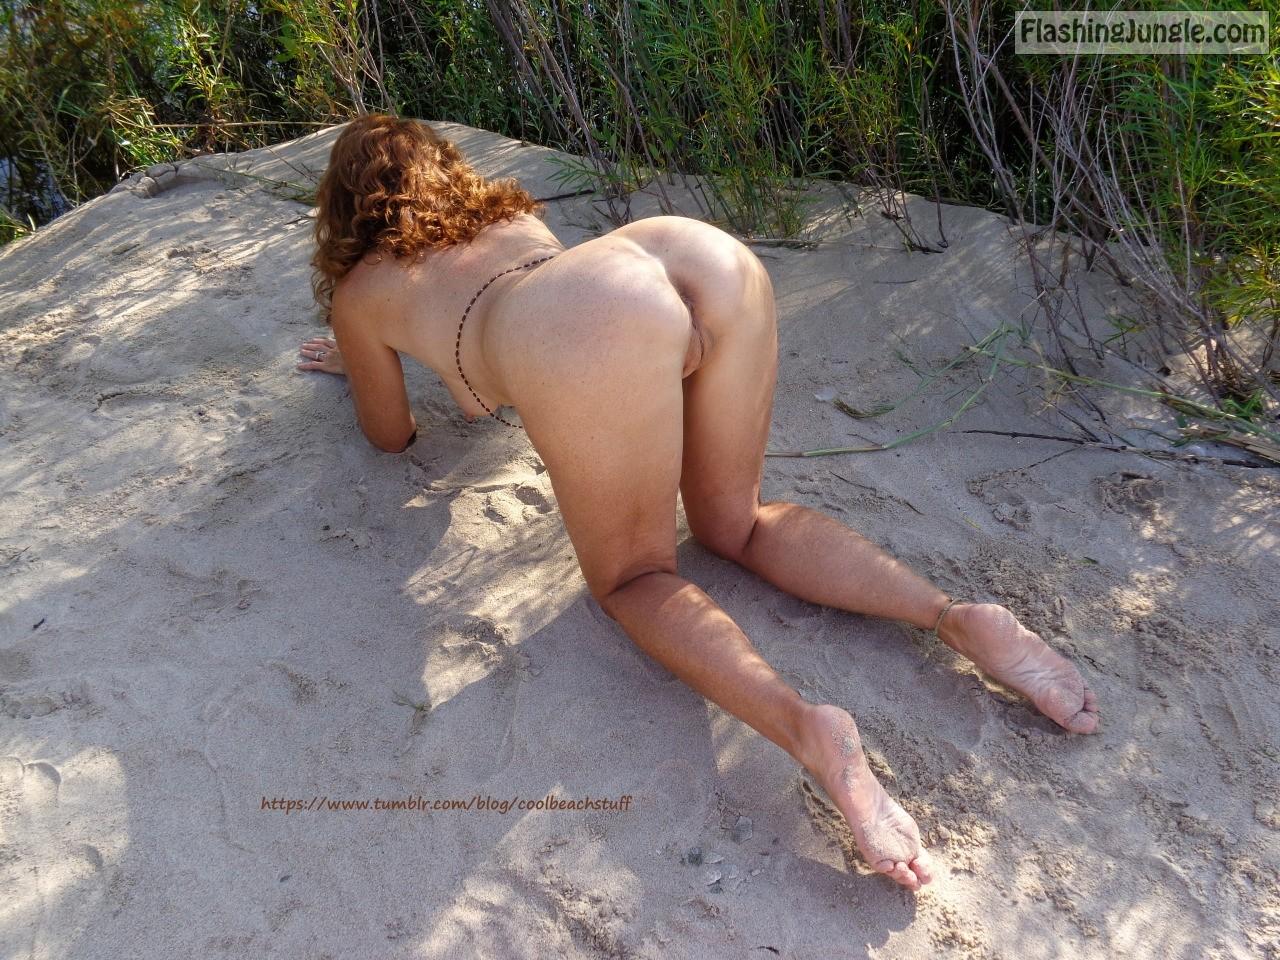 hotwife beach